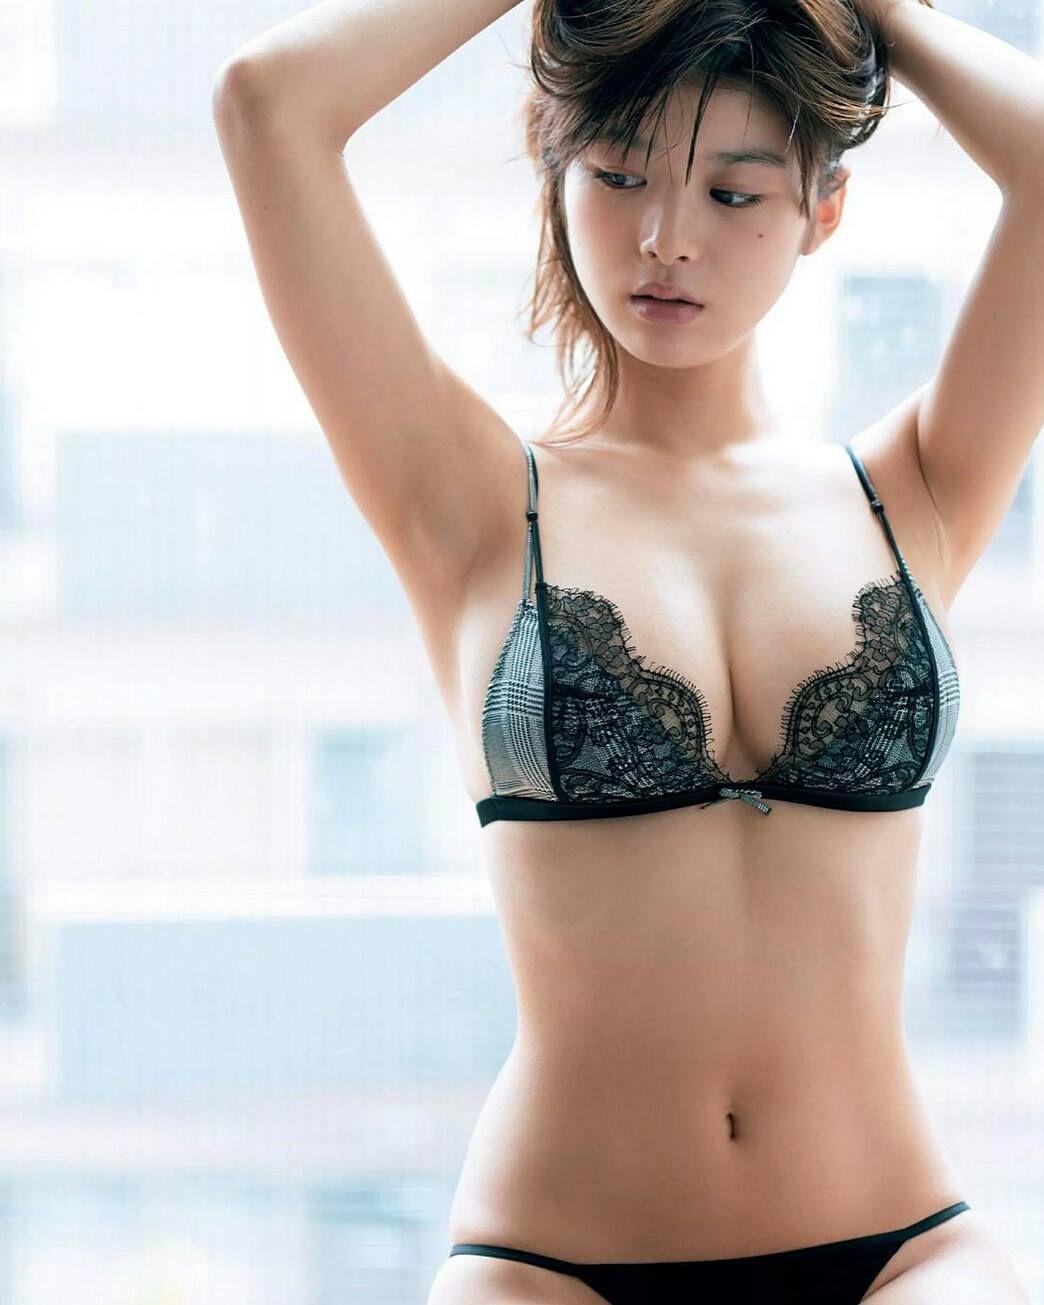 Thong tan line pussy tumblr